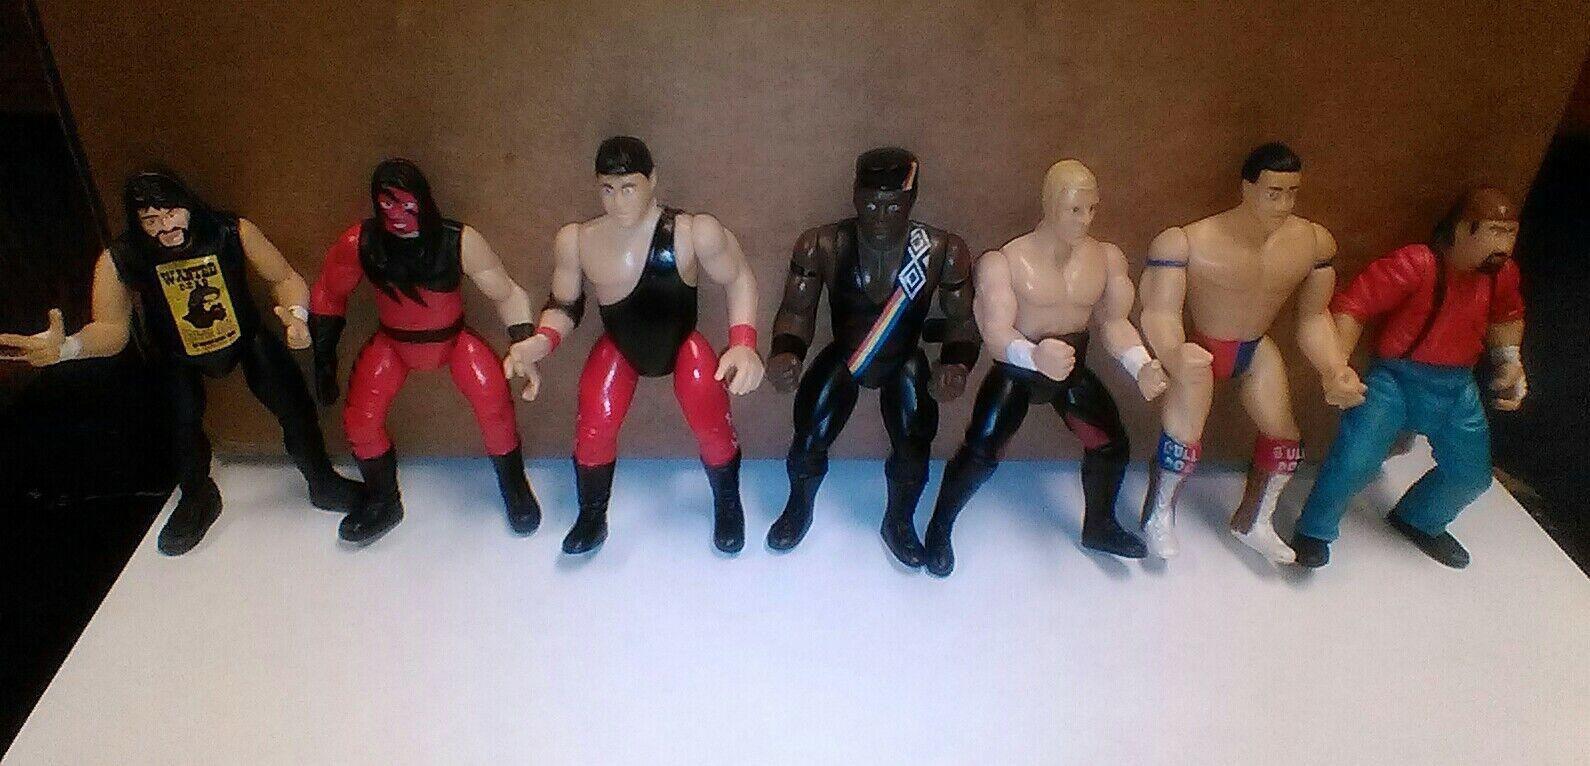 estilo clásico WWF Raw is War Jakks Pacific 1997 1997 1997 Vintage Lote De Figuras Wcw Wwe Nwo AEW Ecw Tna NXT  precios ultra bajos